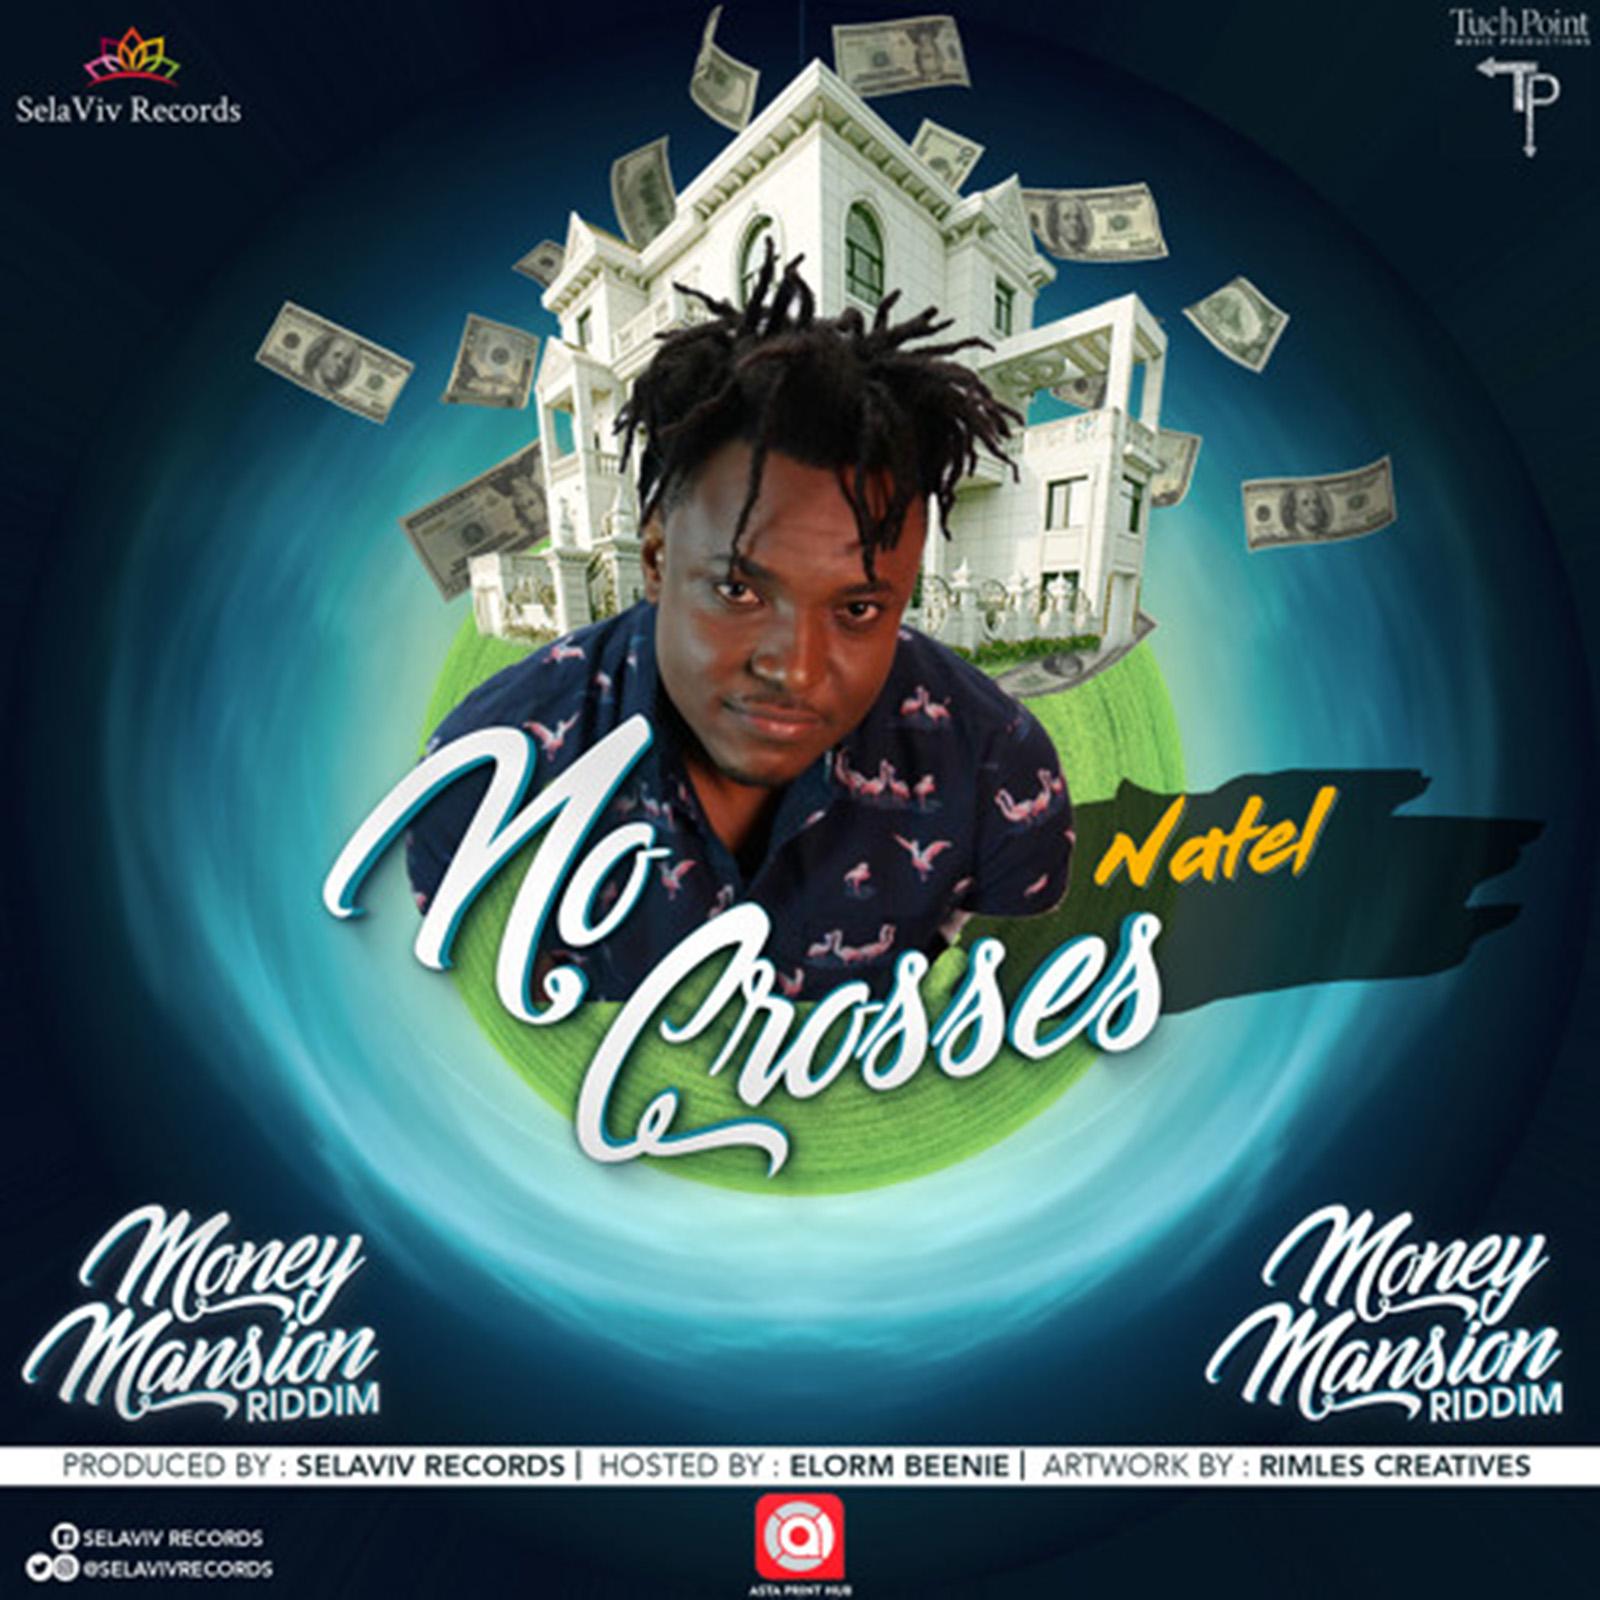 No Crosses (Money Mansion Riddim) by Natel